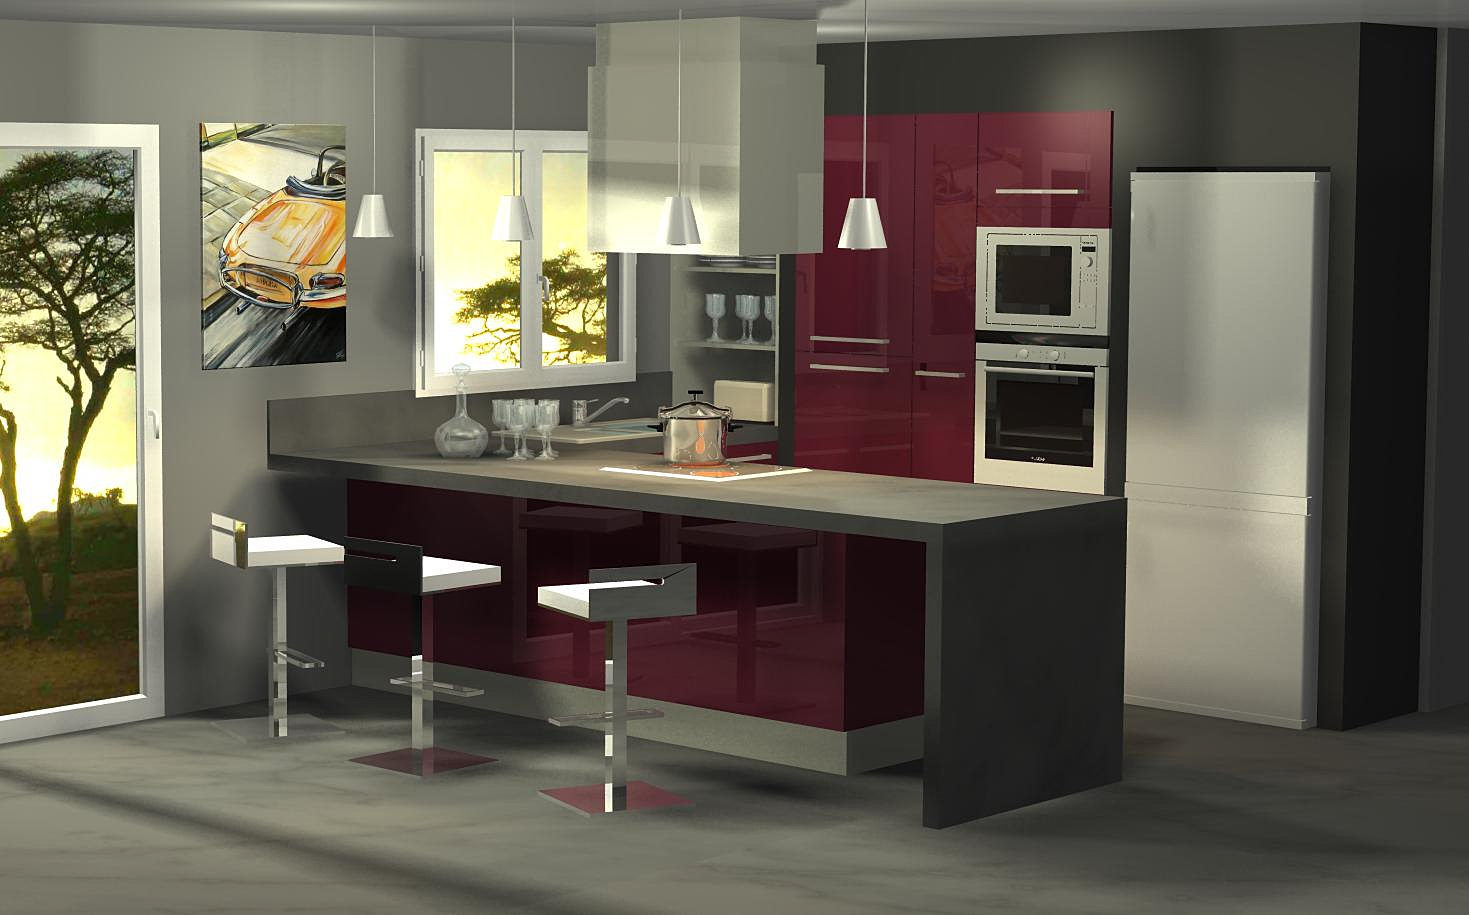 Menuis art cuisine moderne cuisine design dressing vichy for Cuisine aubergine et grise